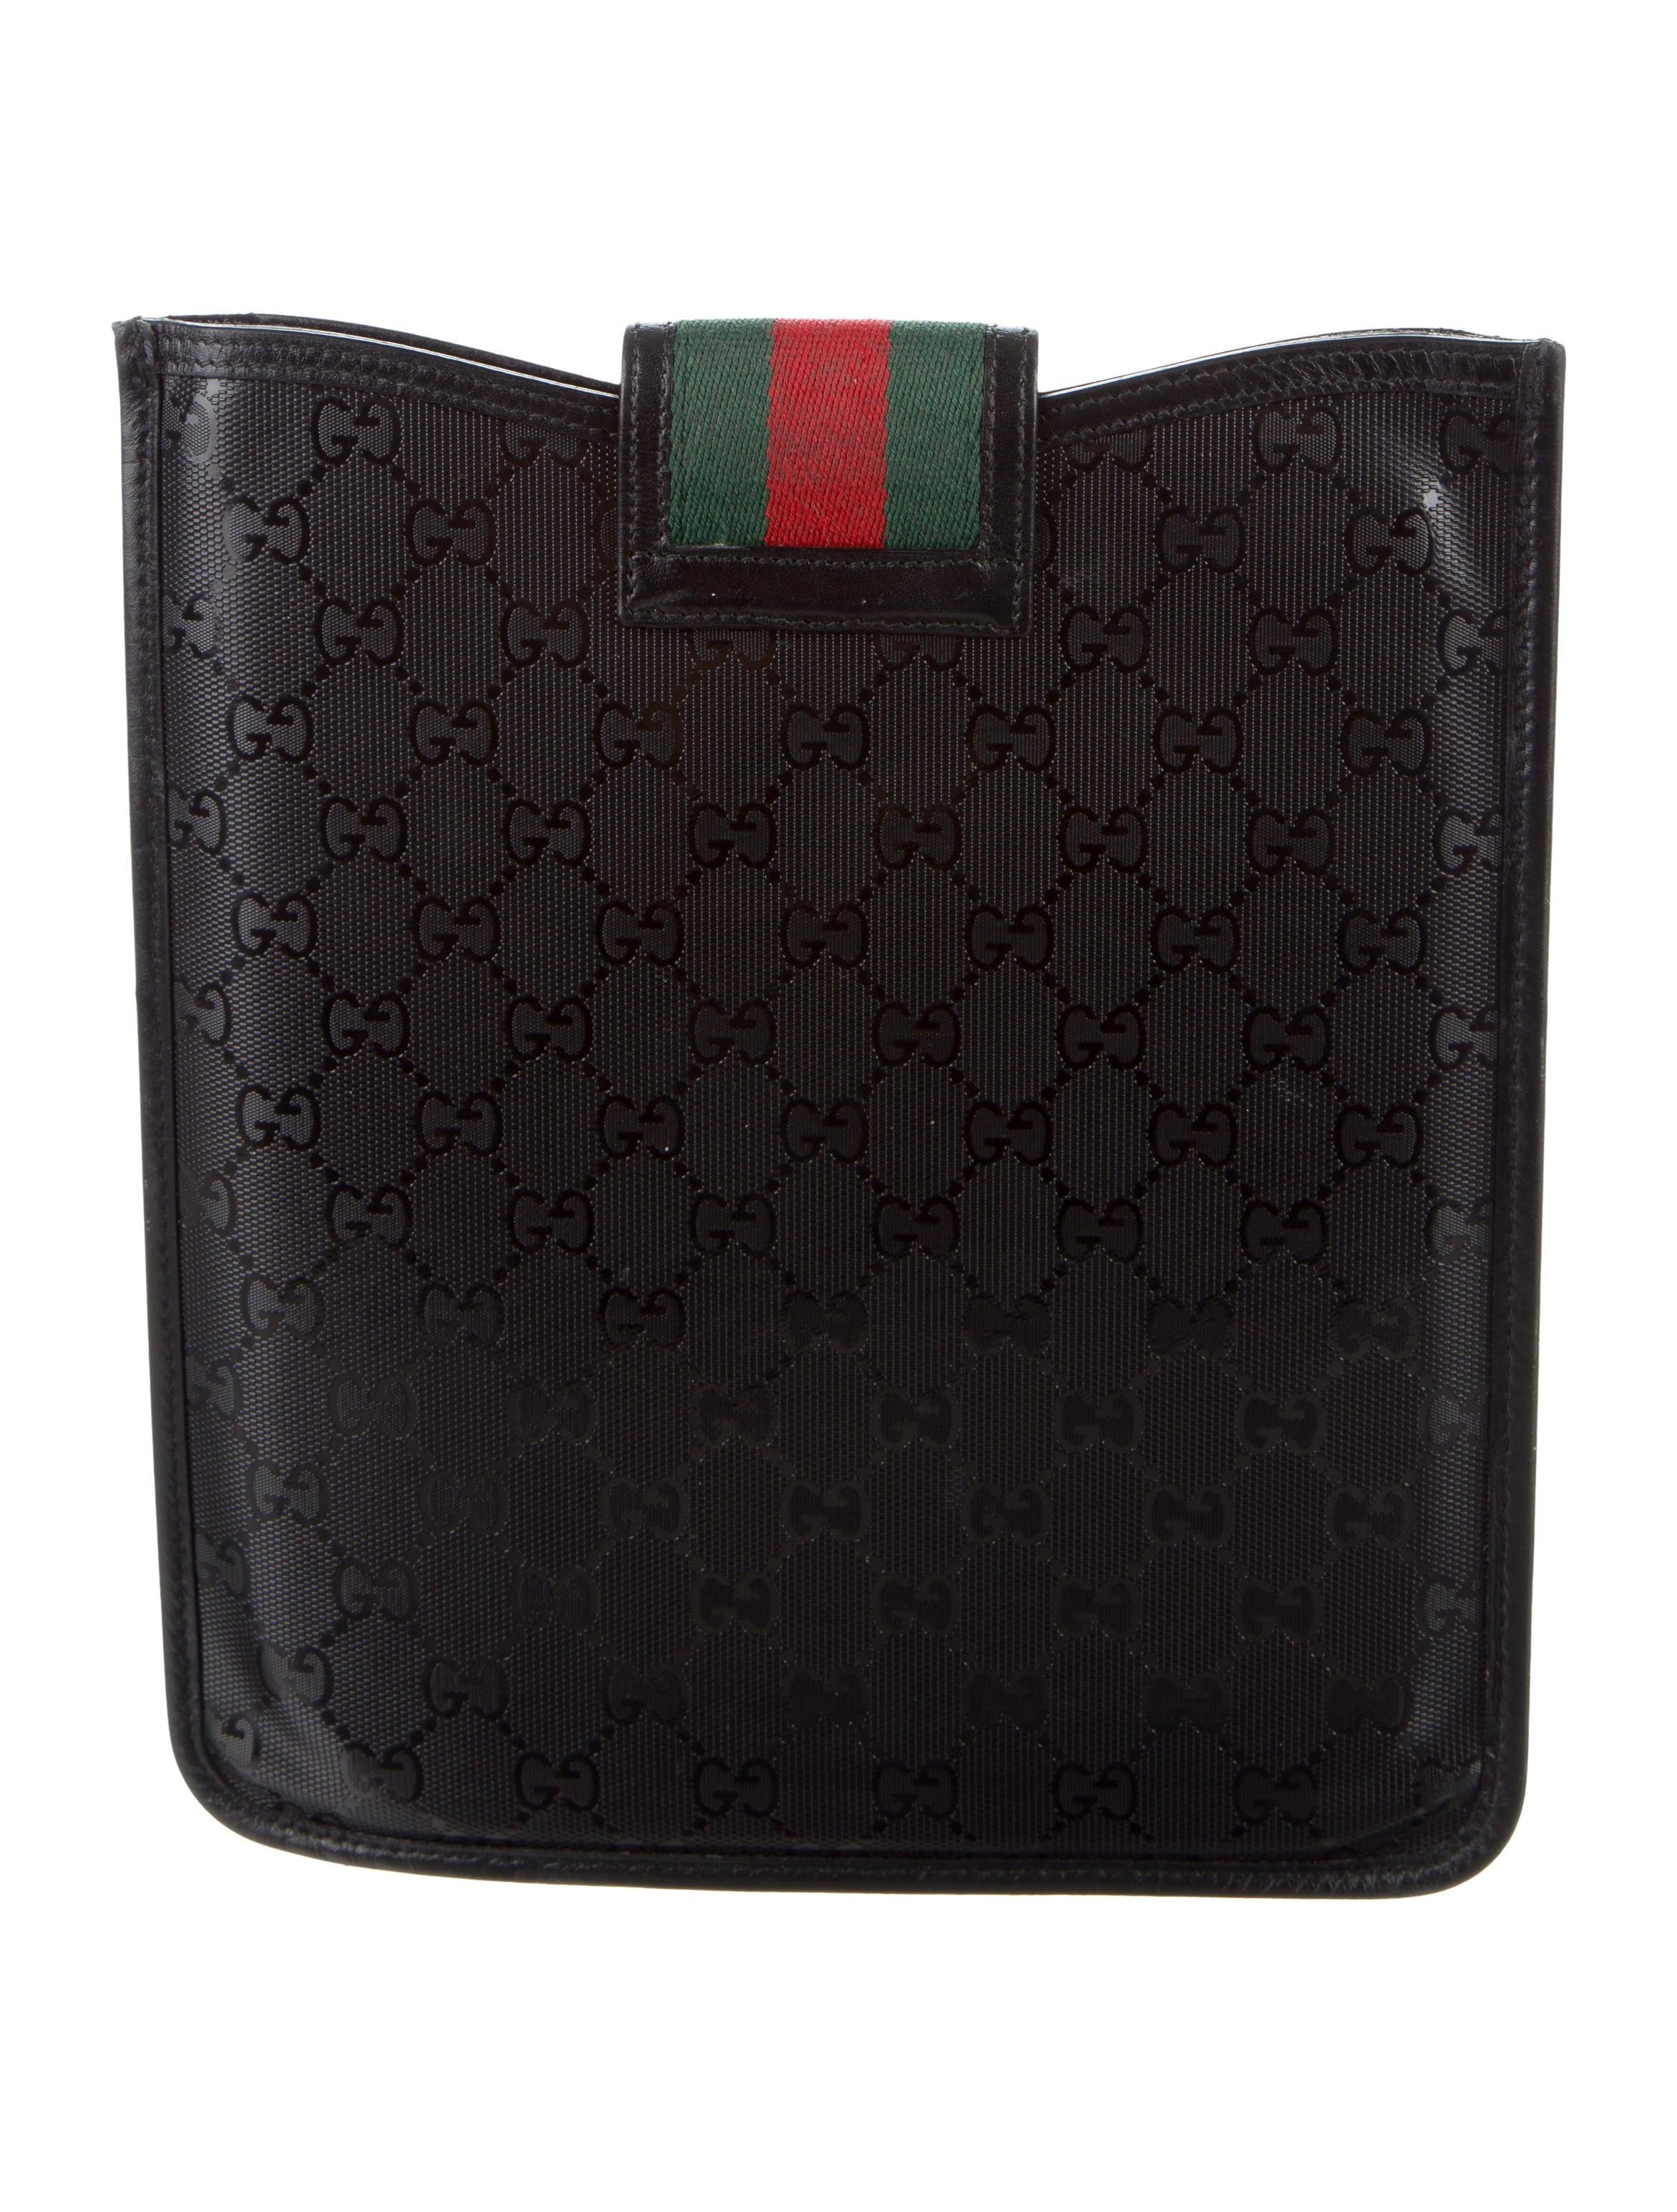 Gucci Gg Imprim 233 Ipad Case Technology Guc157940 The